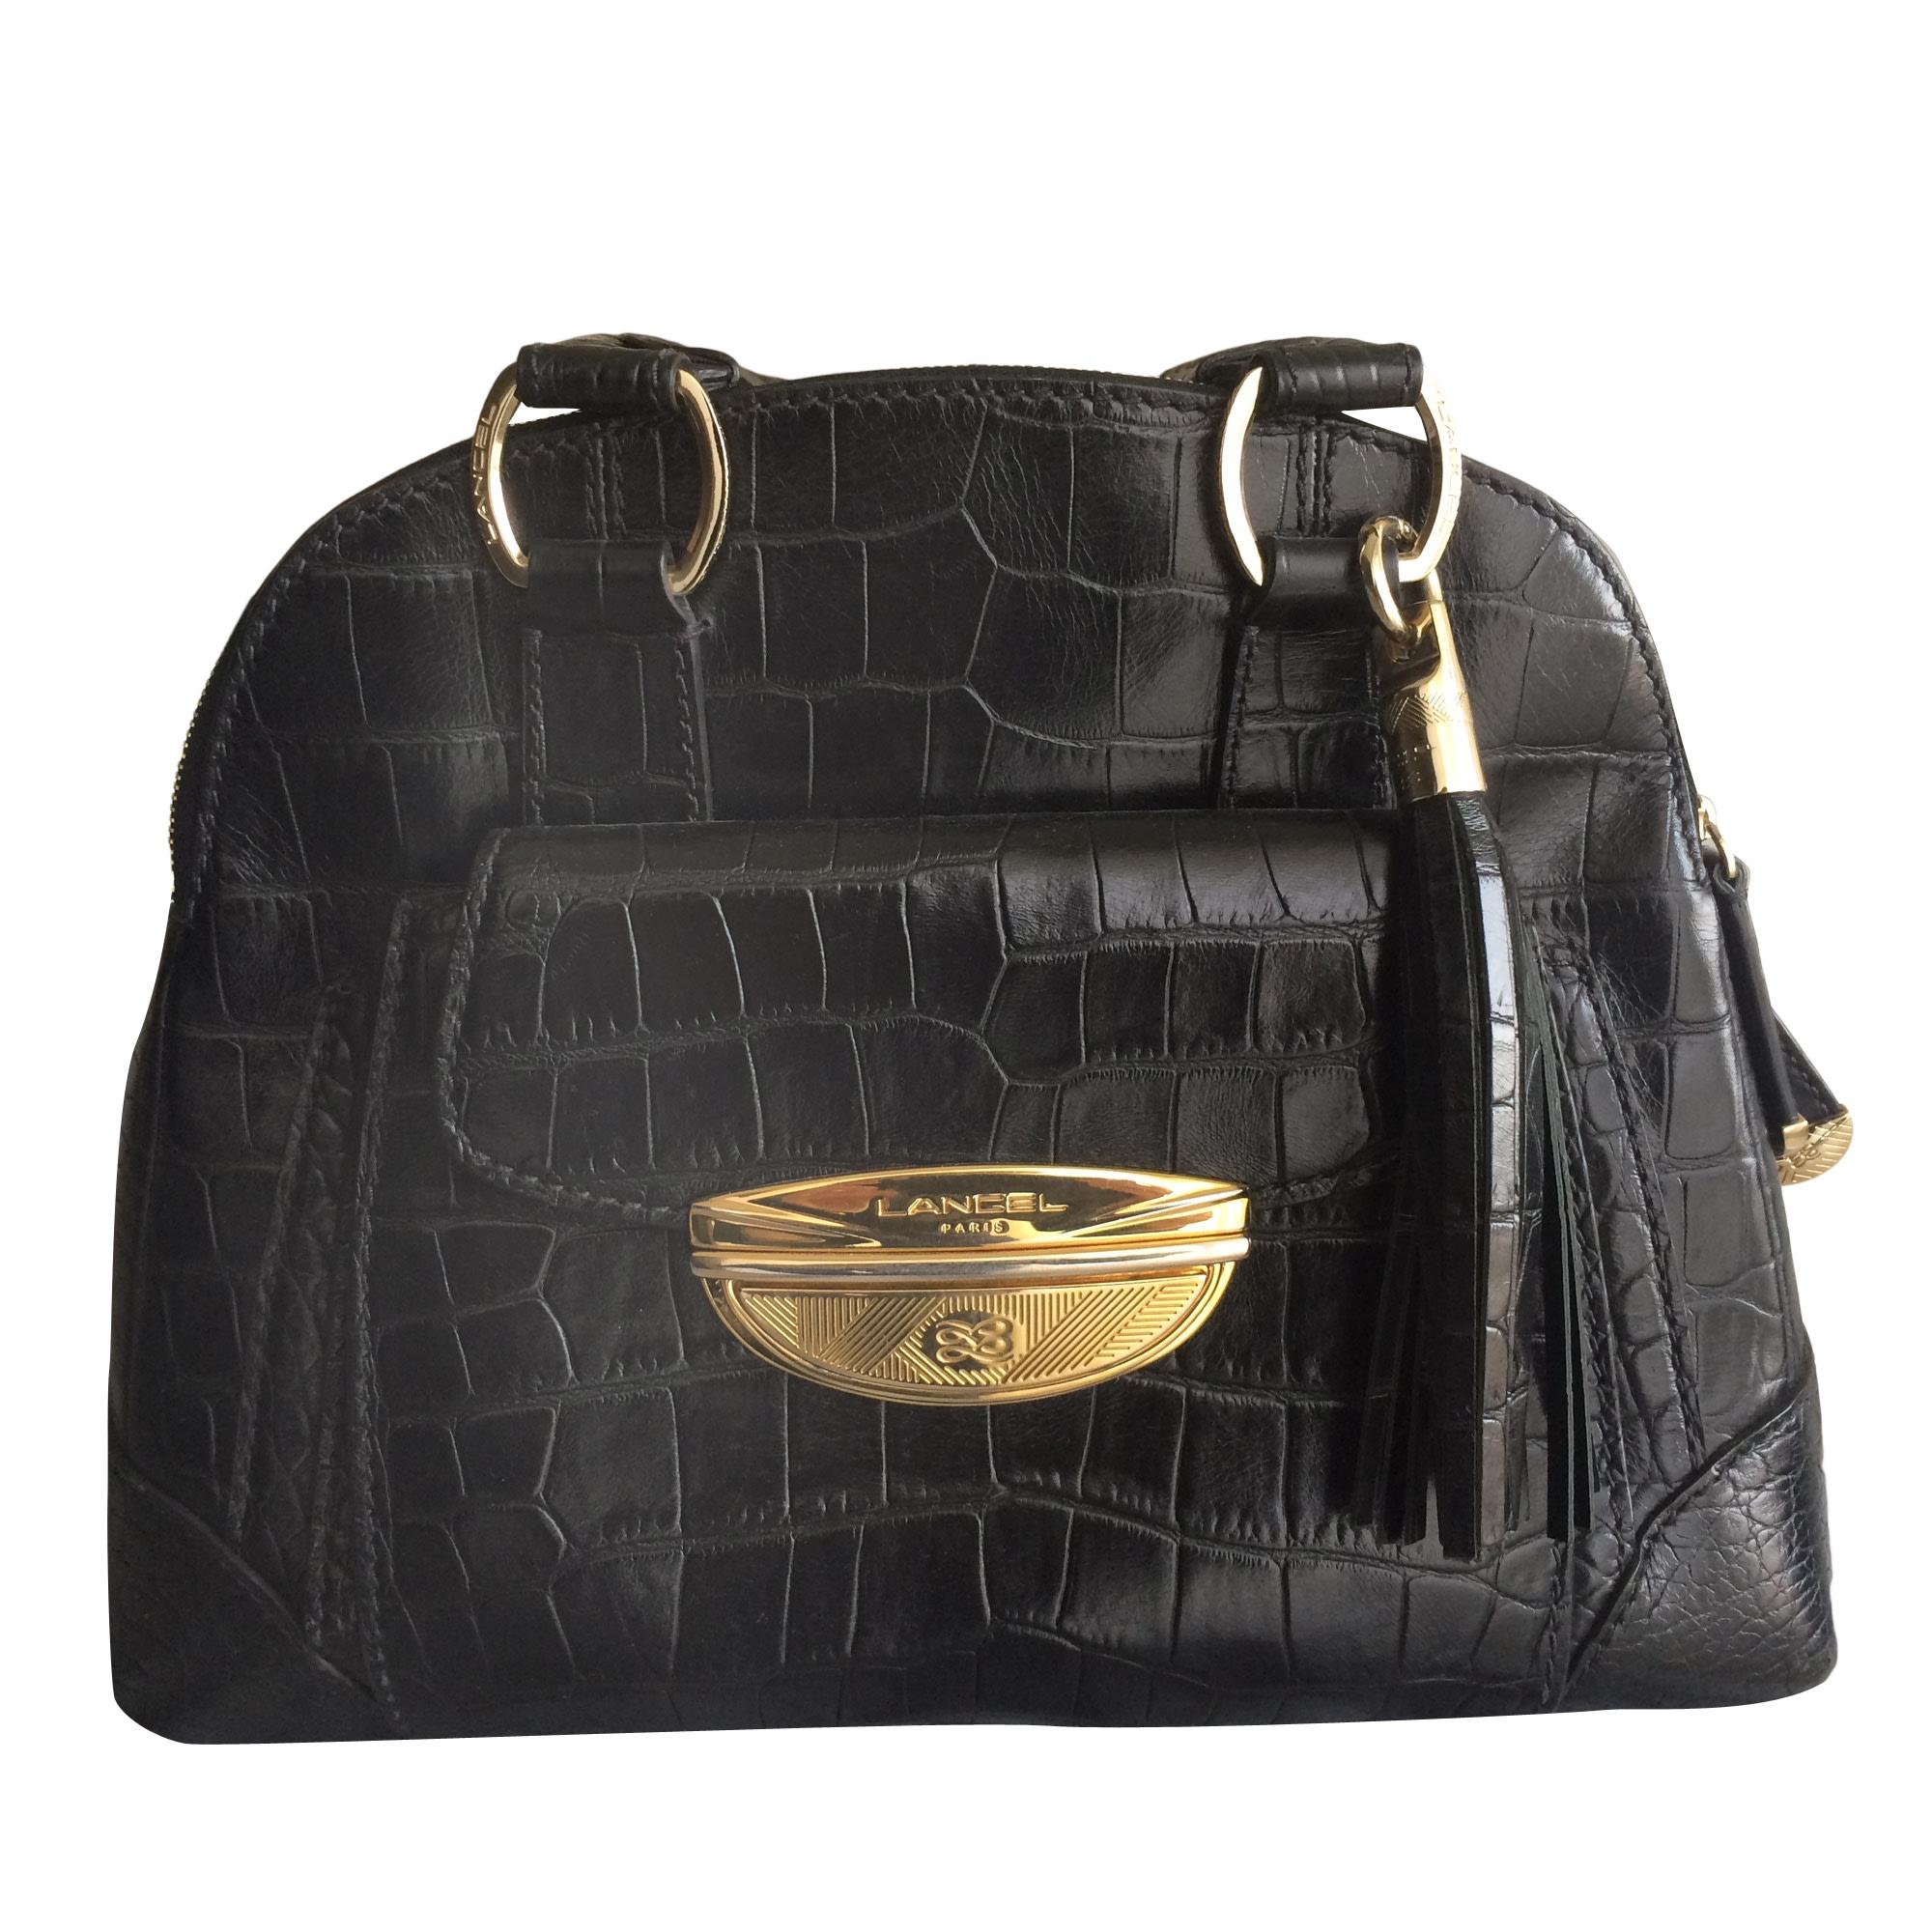 362ddf4977 Sac à main en cuir LANCEL brigitte bardot noir vendu par Alexandra ...